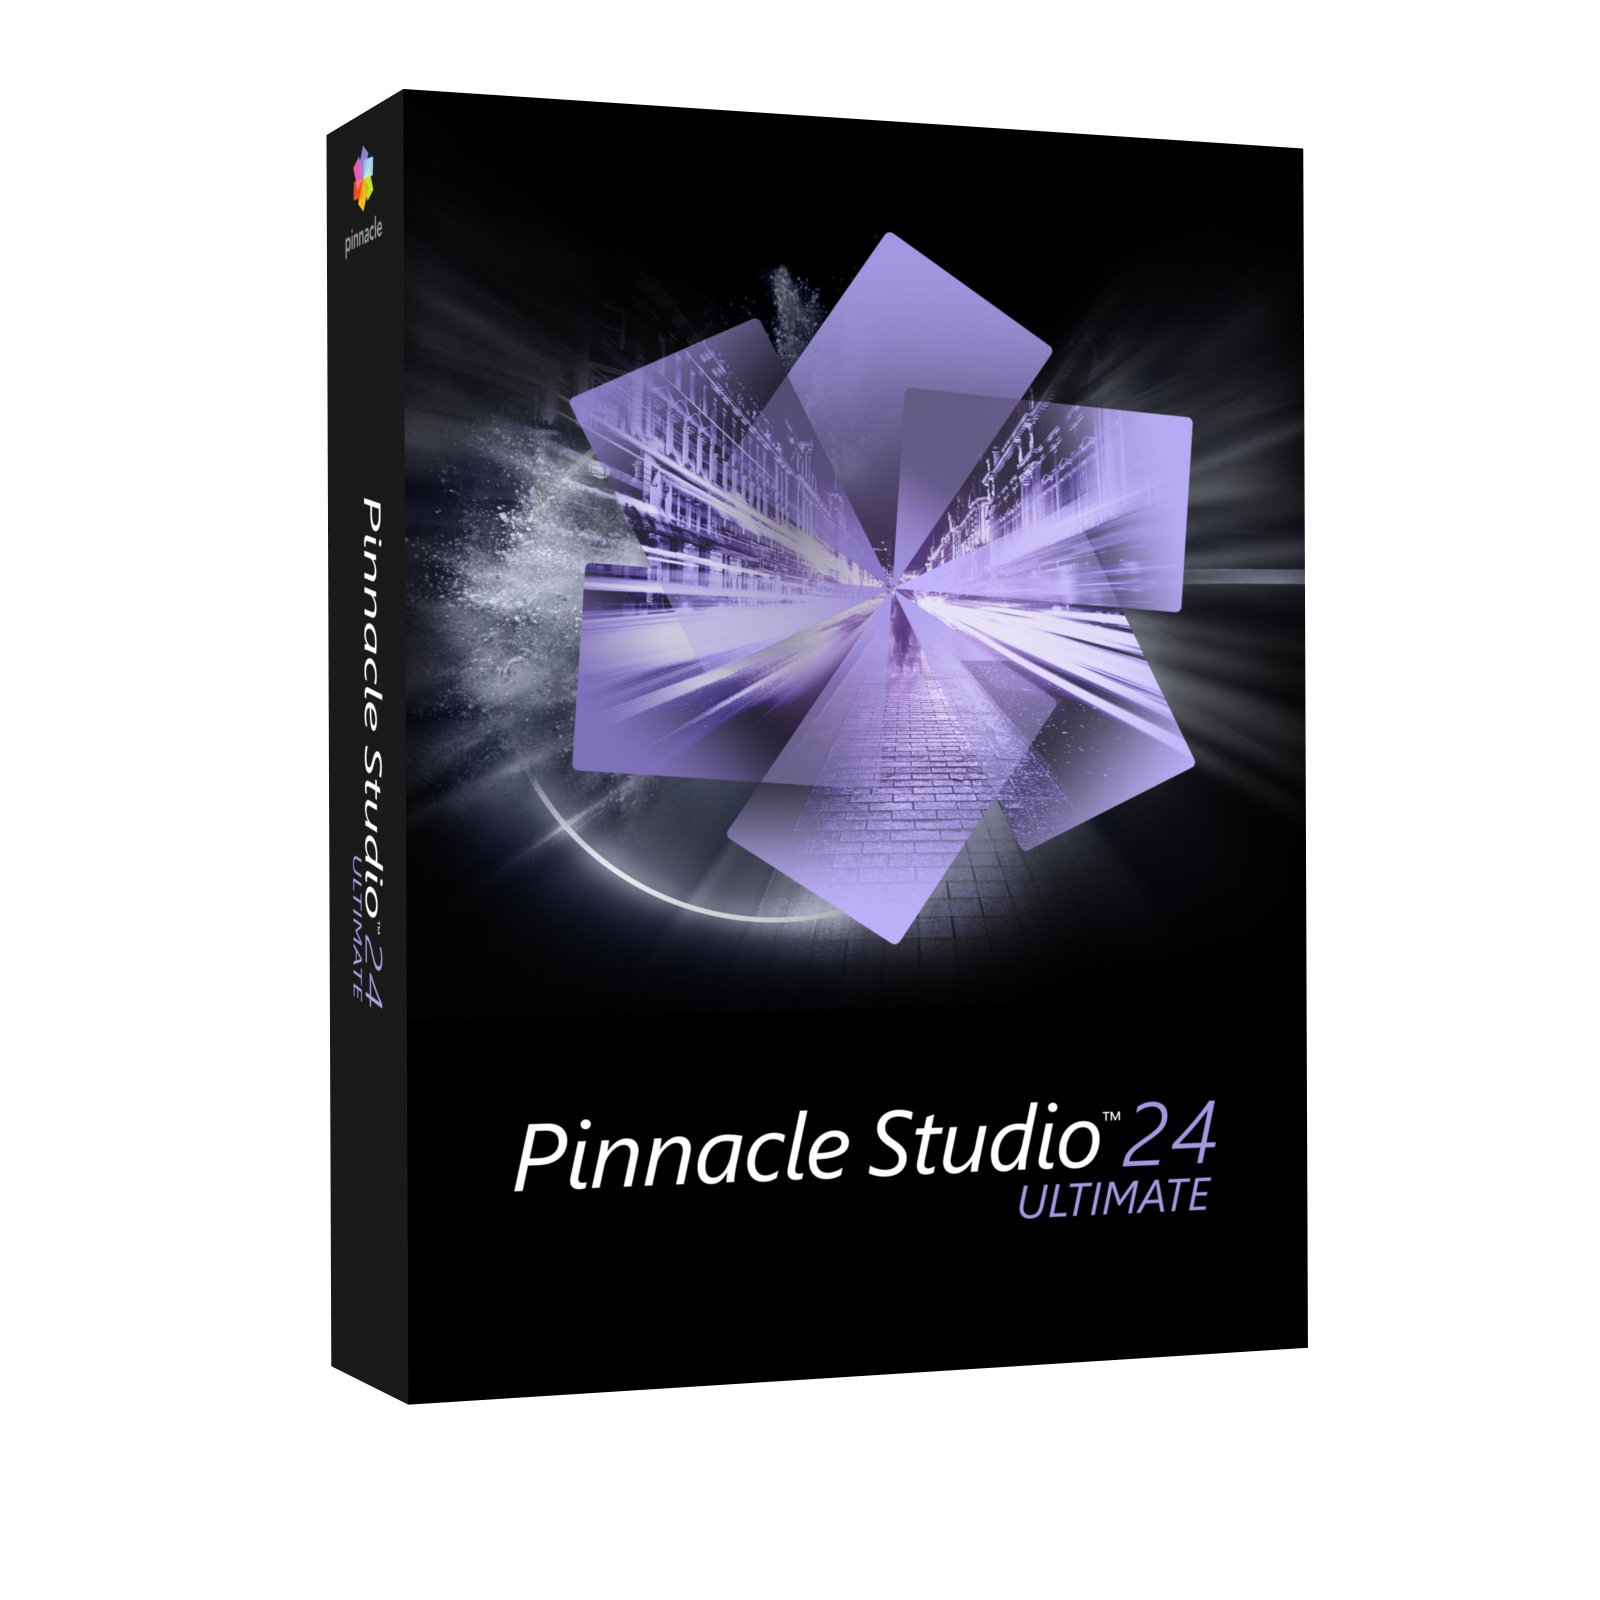 Pinnacle Studio 24 Ultimate (box) CZ Upgrade - PNST24ULMLEUUPG